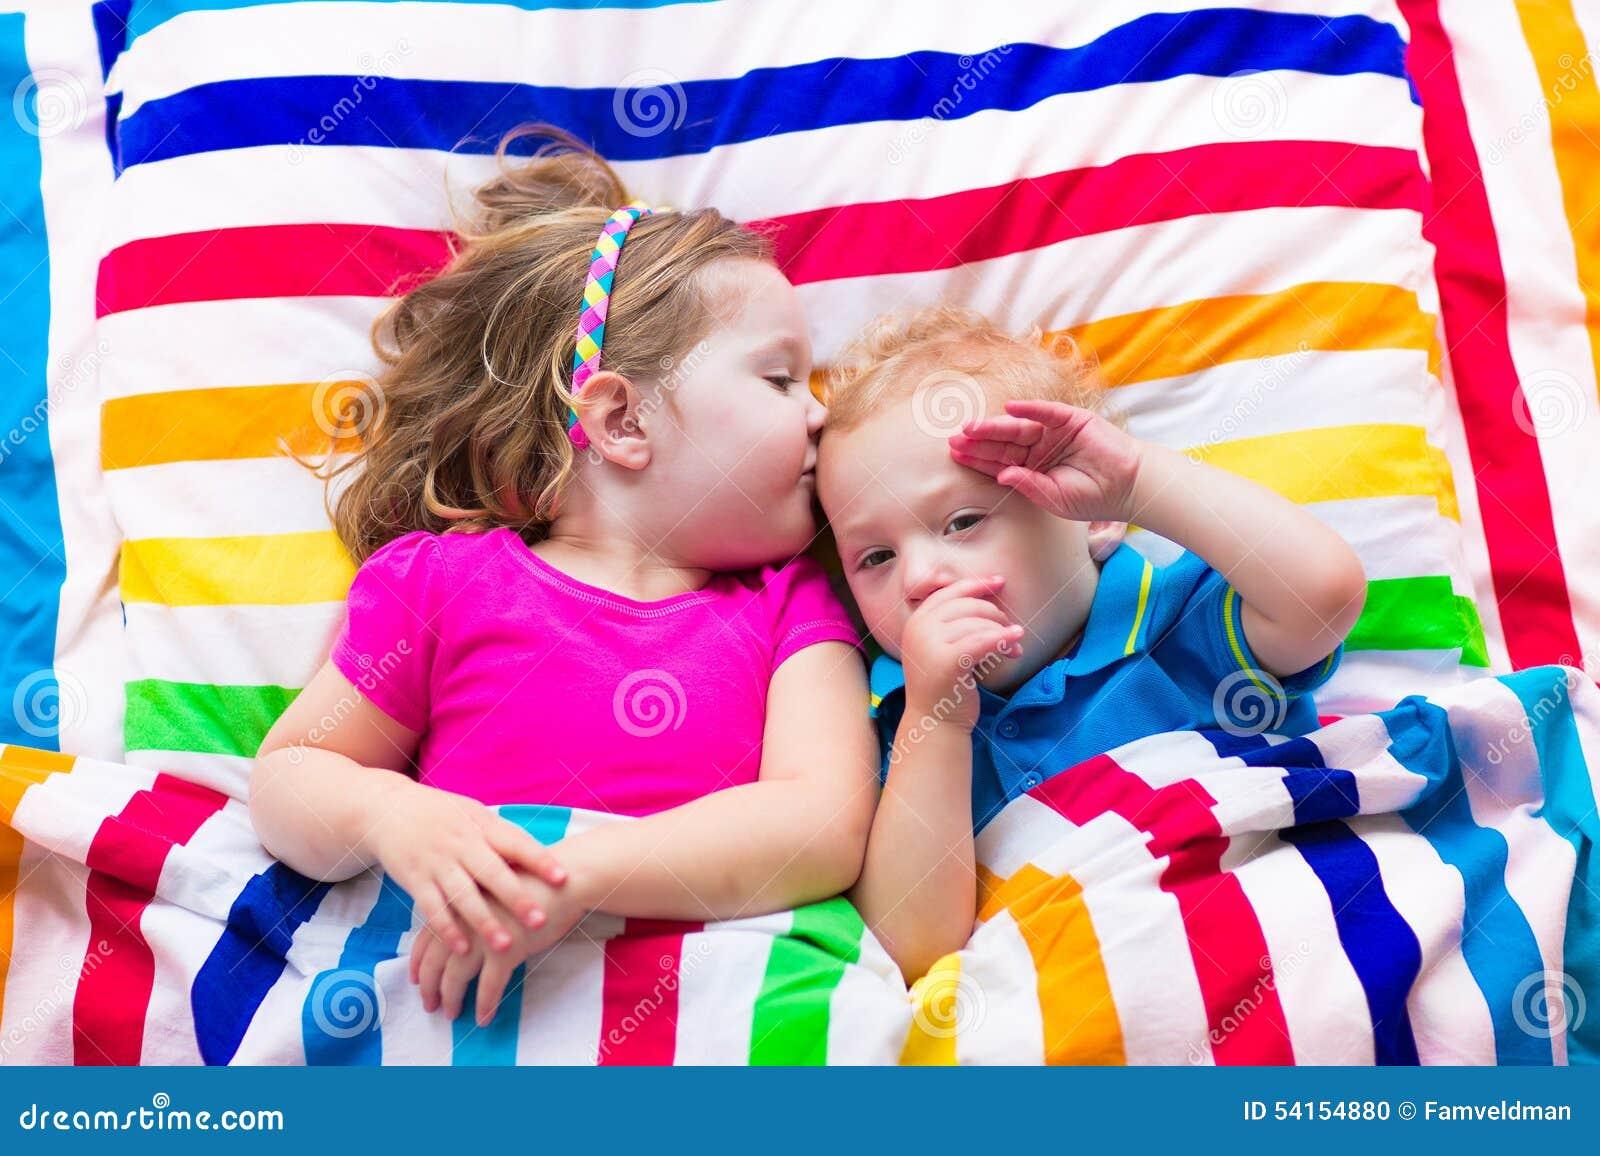 Cute Children Sleeping Under Colorful Blanket Stock Photo